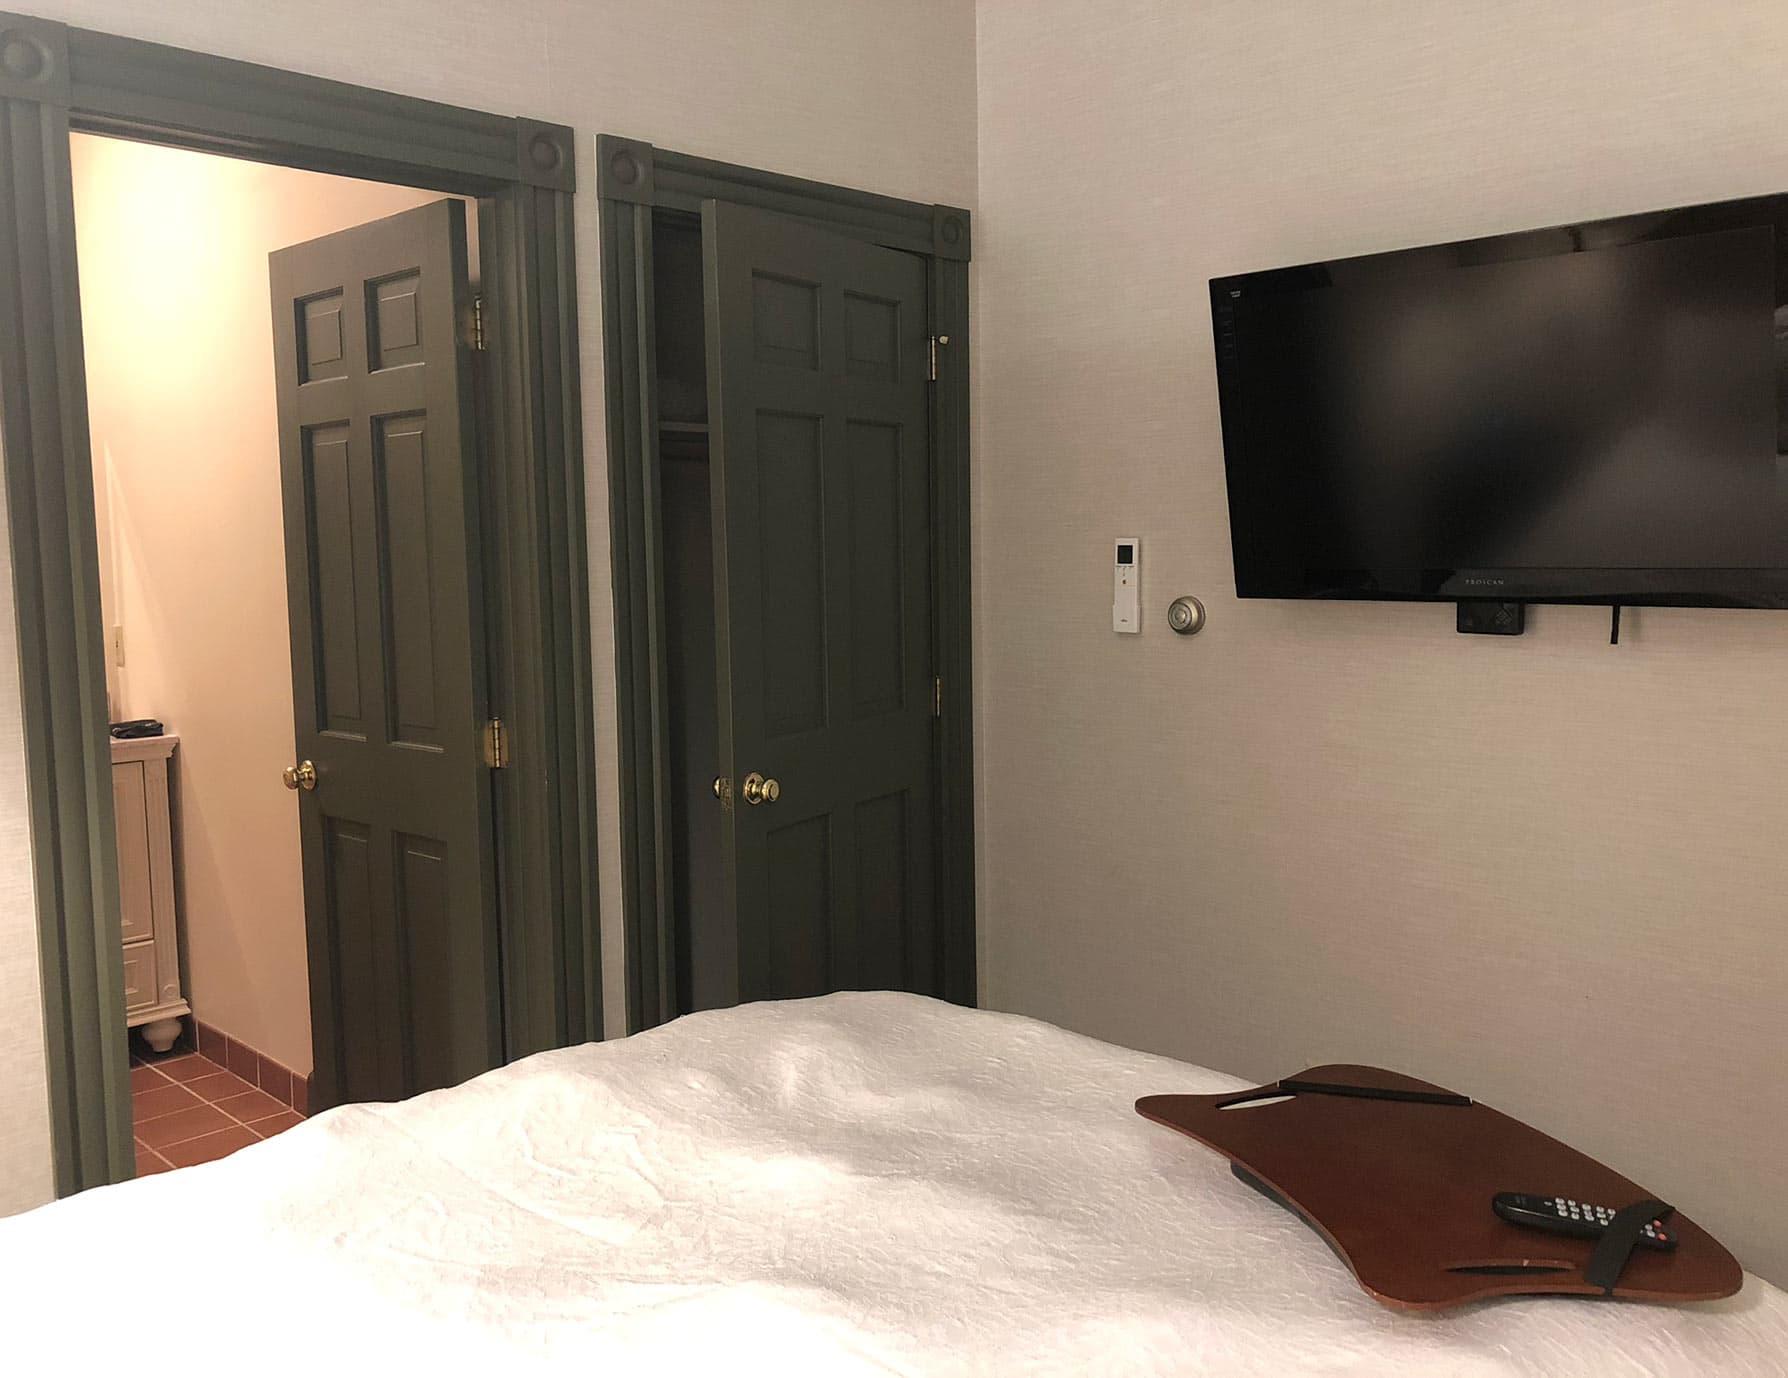 Bed, and TV in Smallest Room in Berkshires - Berkshires Inn